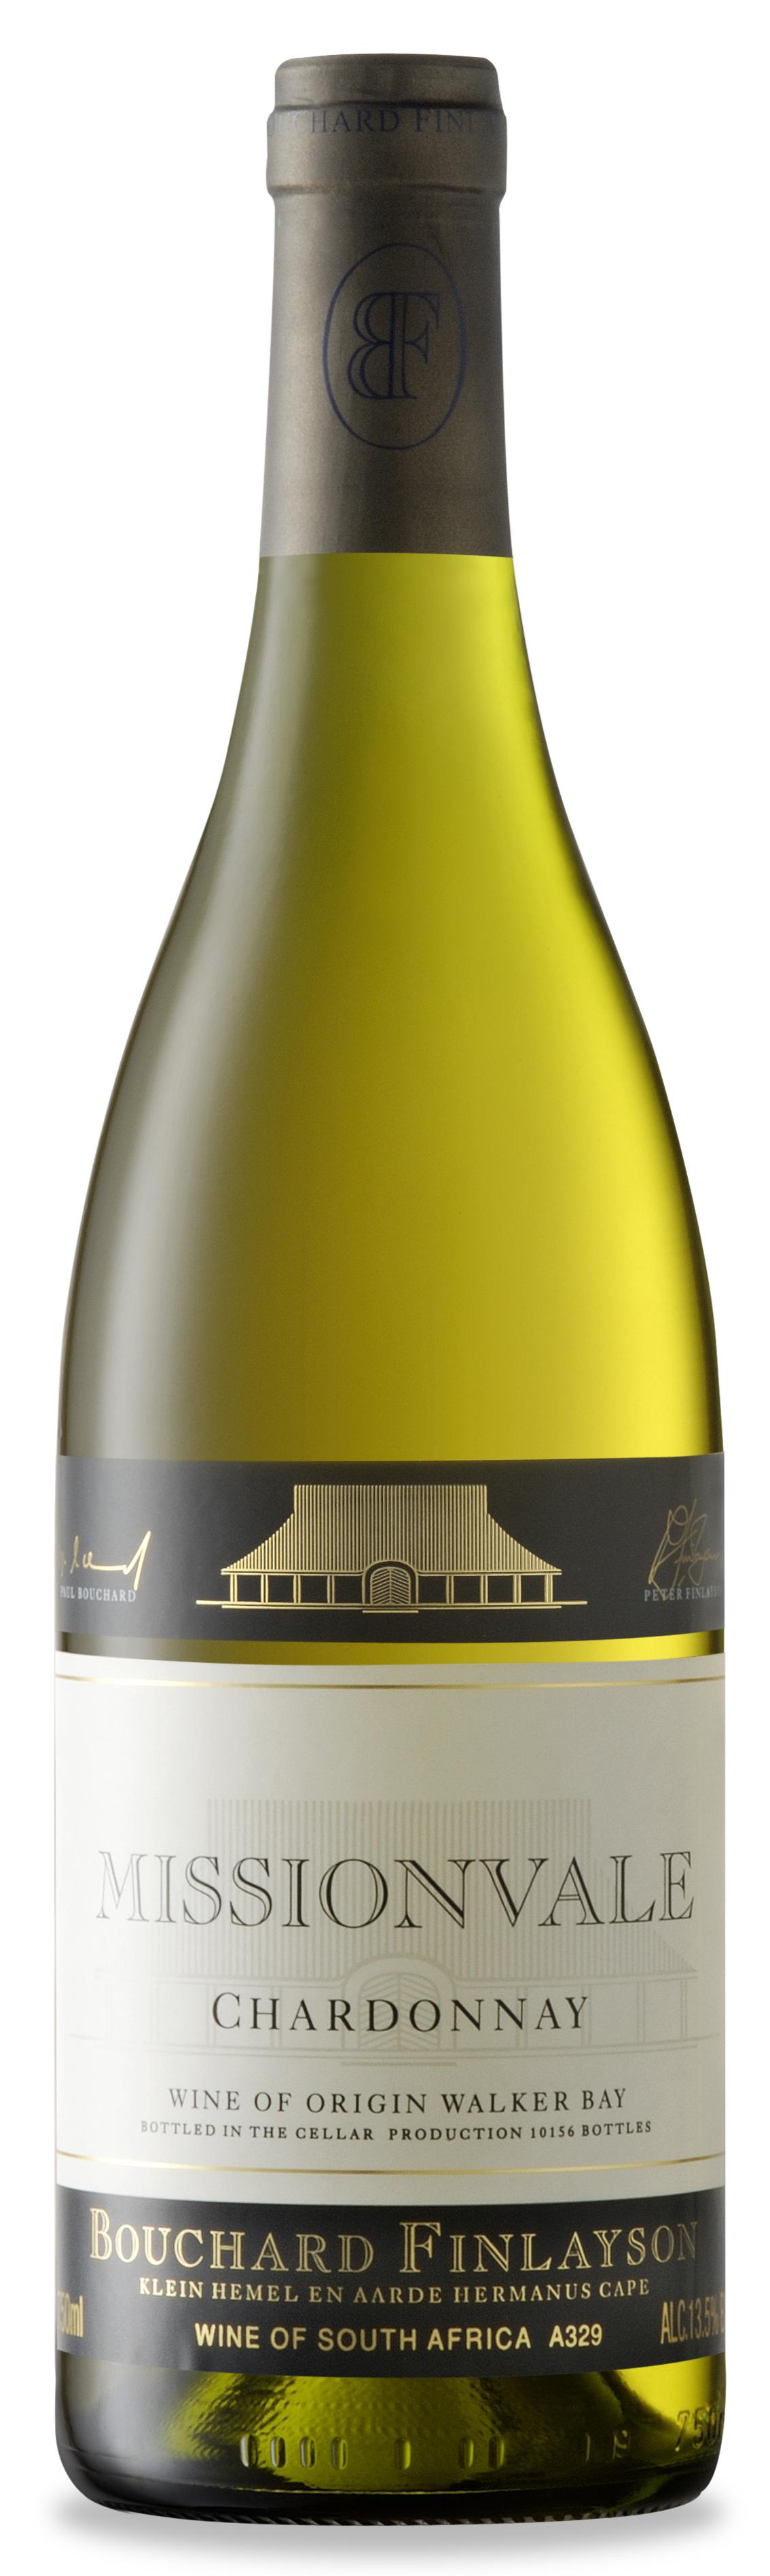 Missionvale Chardonnay